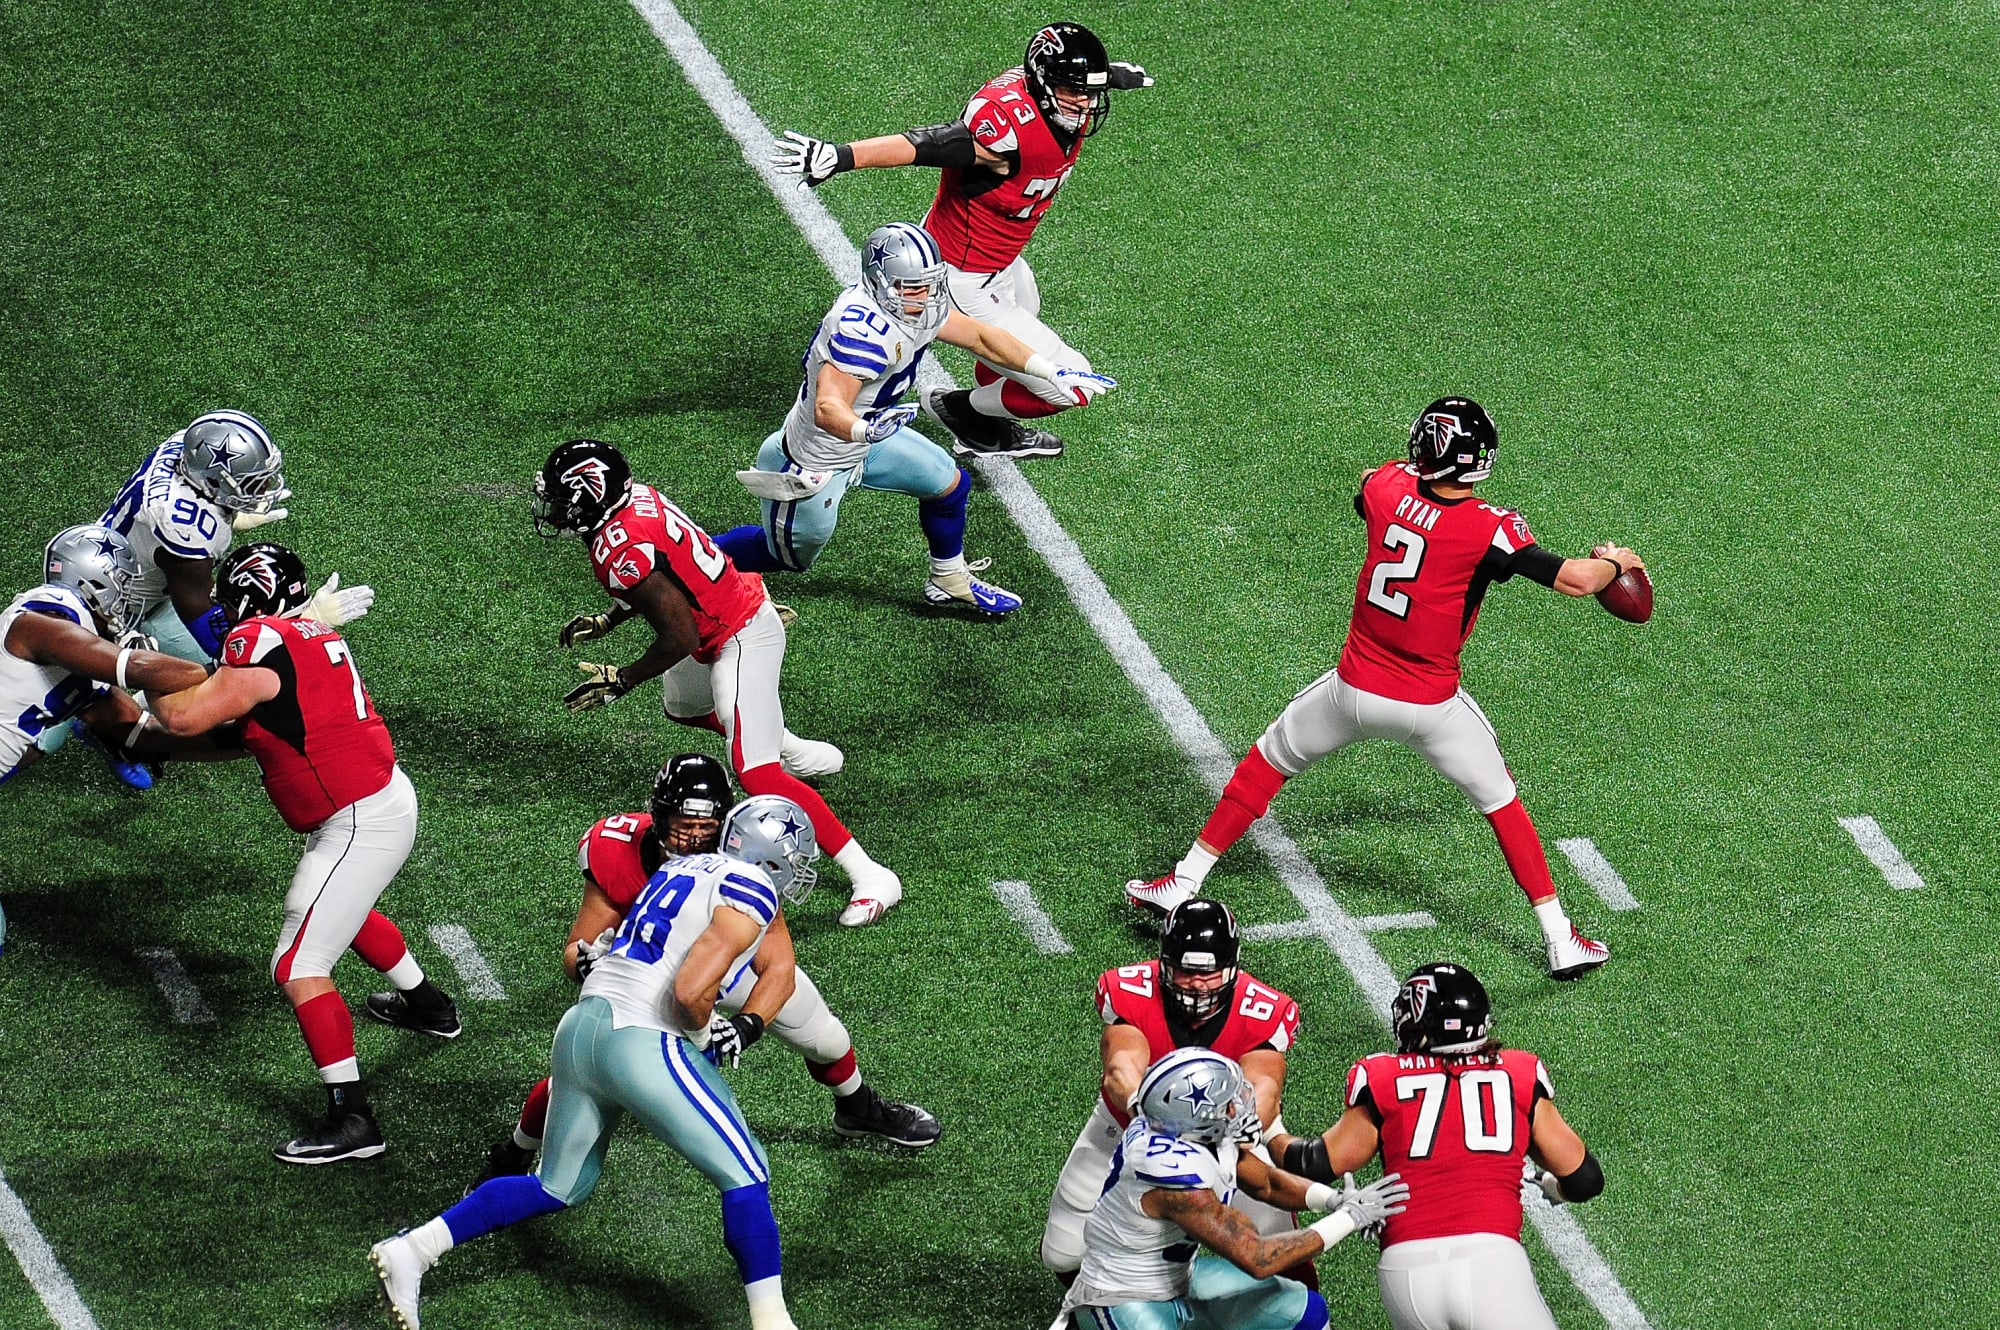 Quarterback power ranking 2017: Atlanta Falcons looking